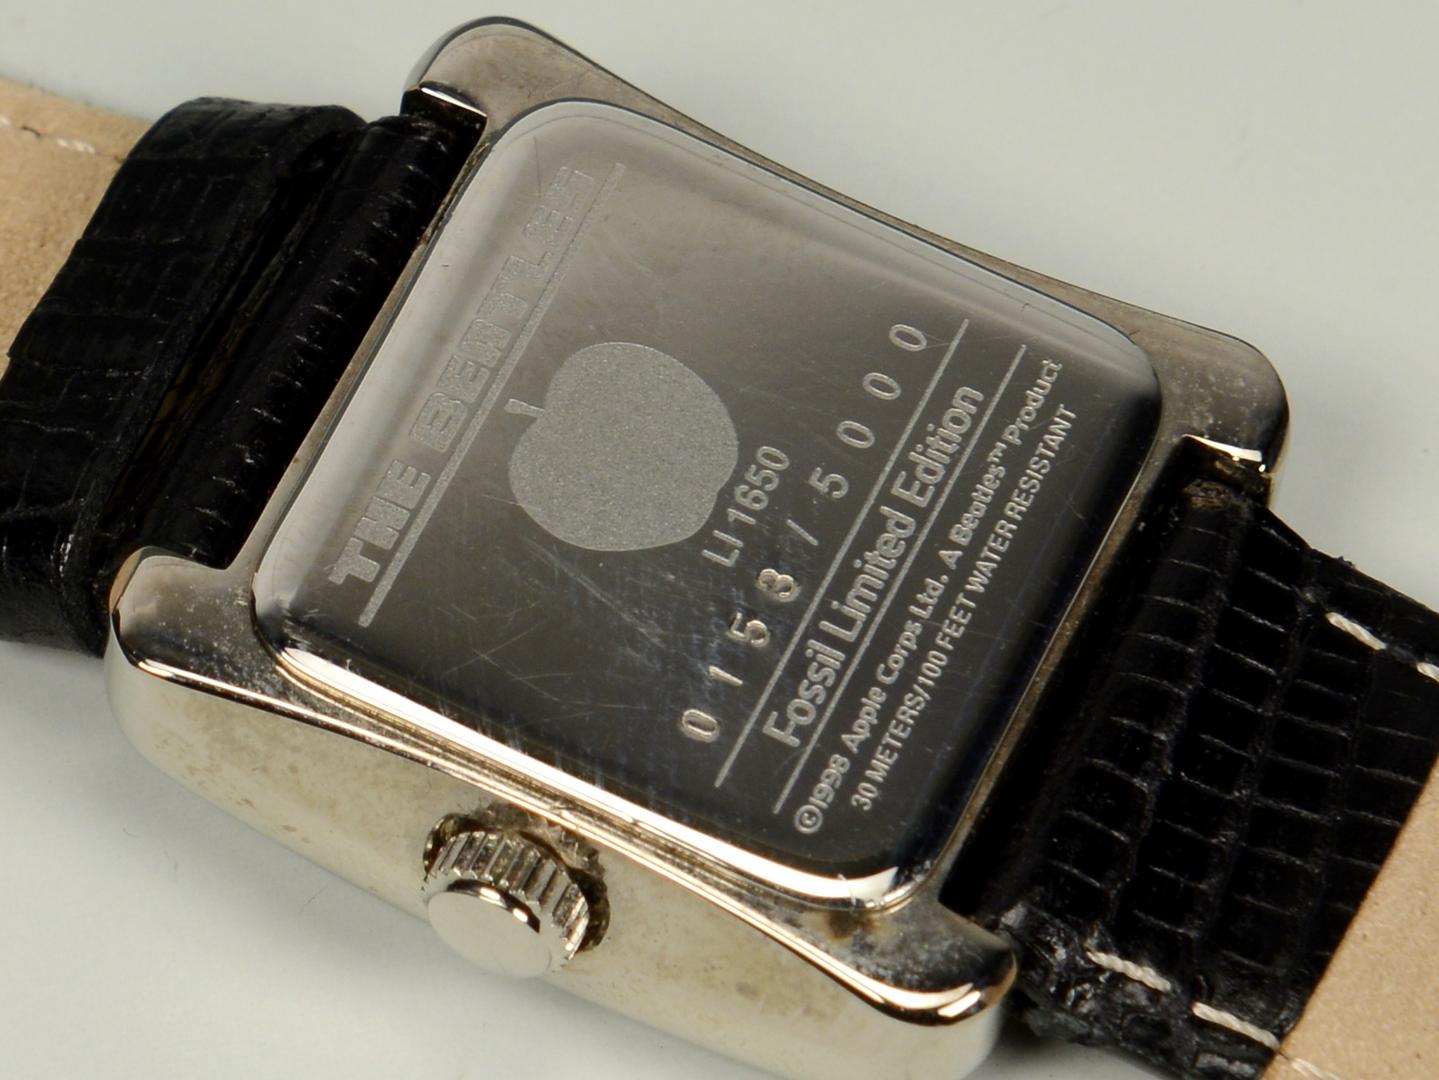 Lot 3088319: Grouping of Beatles Memorabilia, 6 items